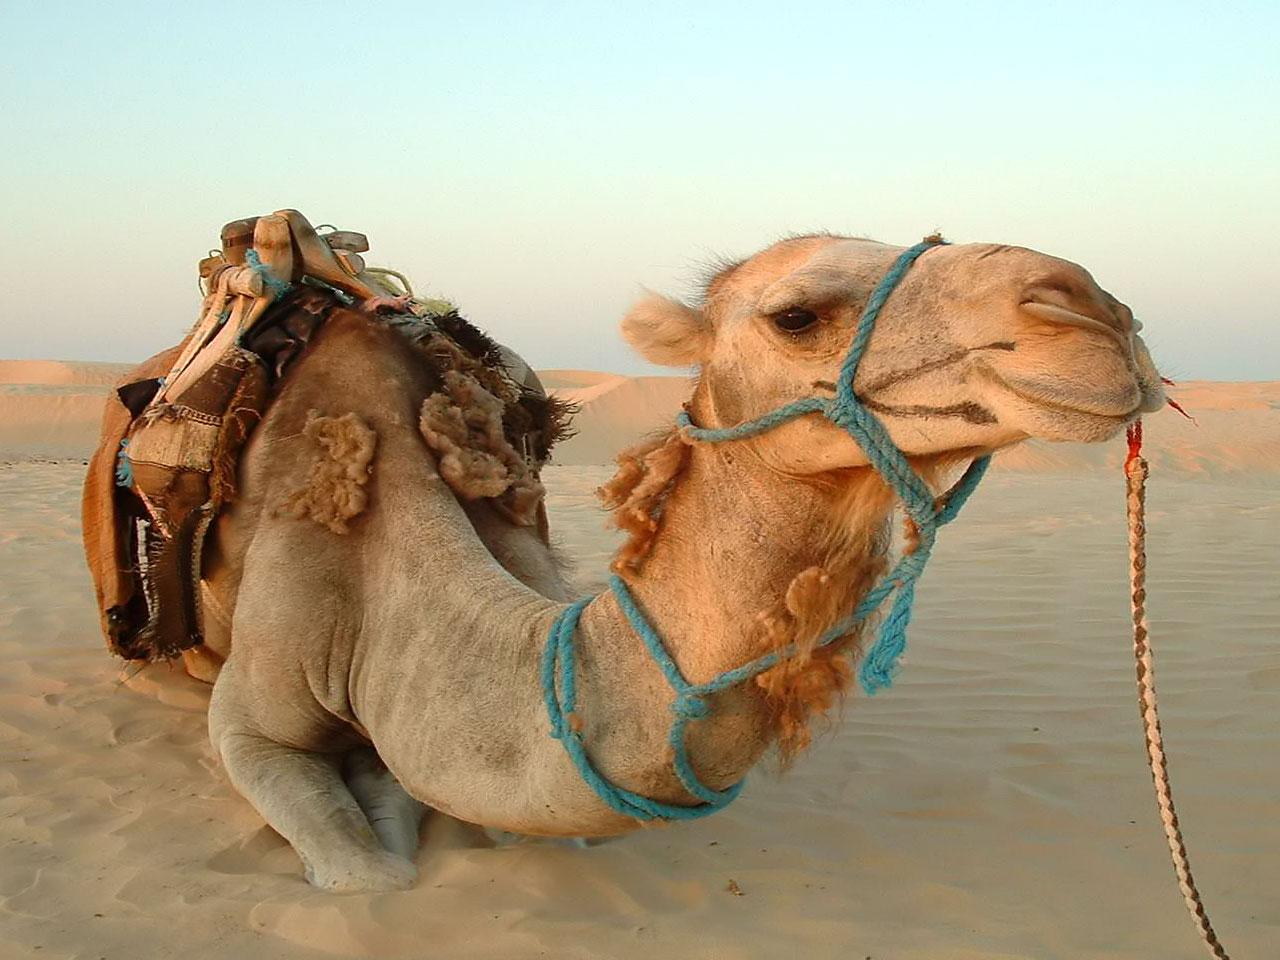 Camel full hd wallpapers